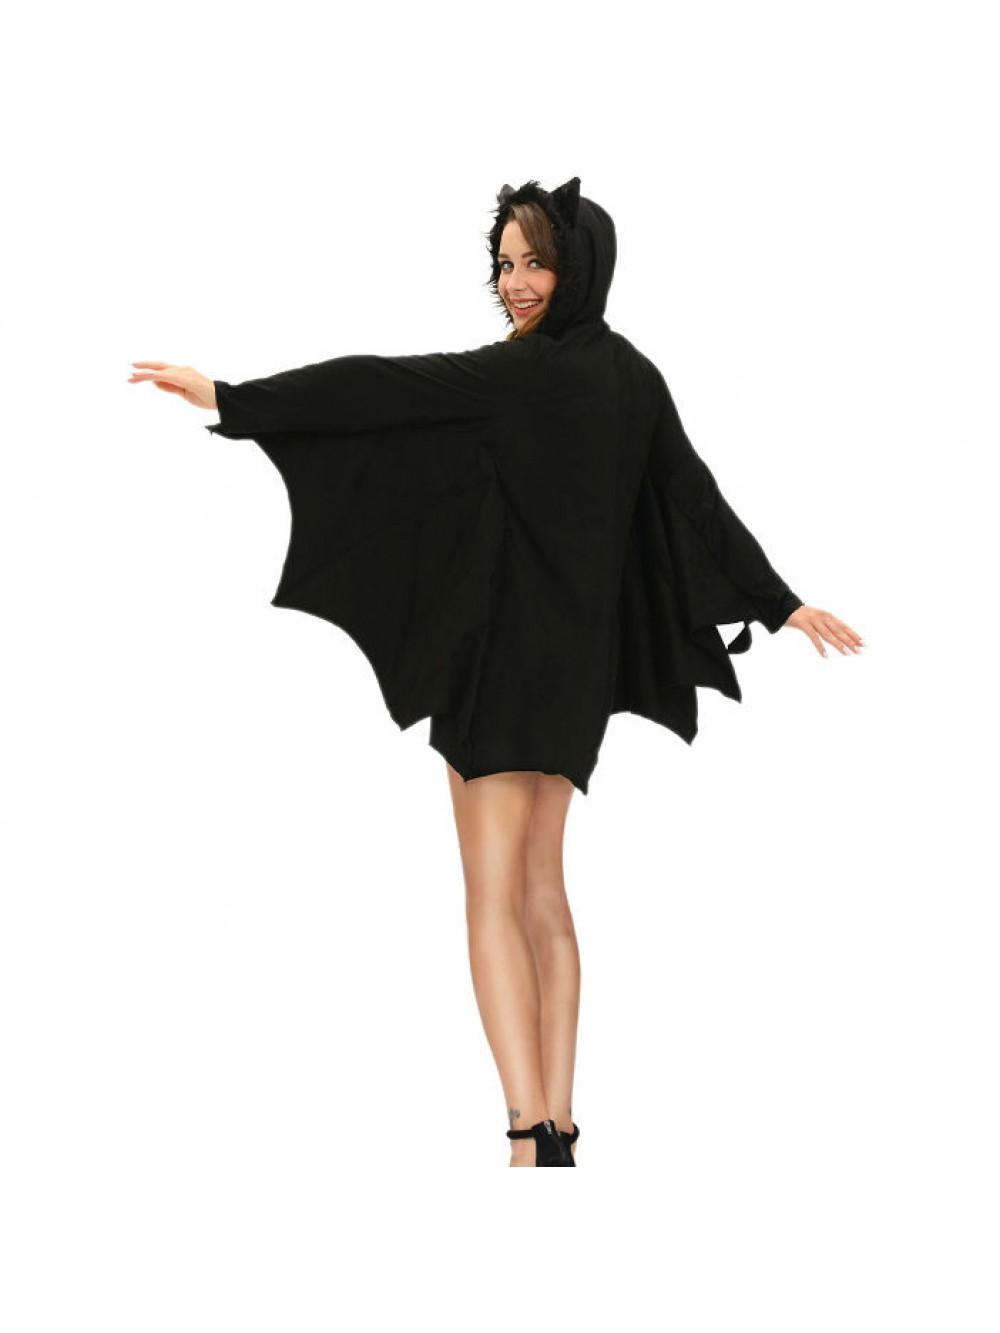 BAT ADULT COSTUME